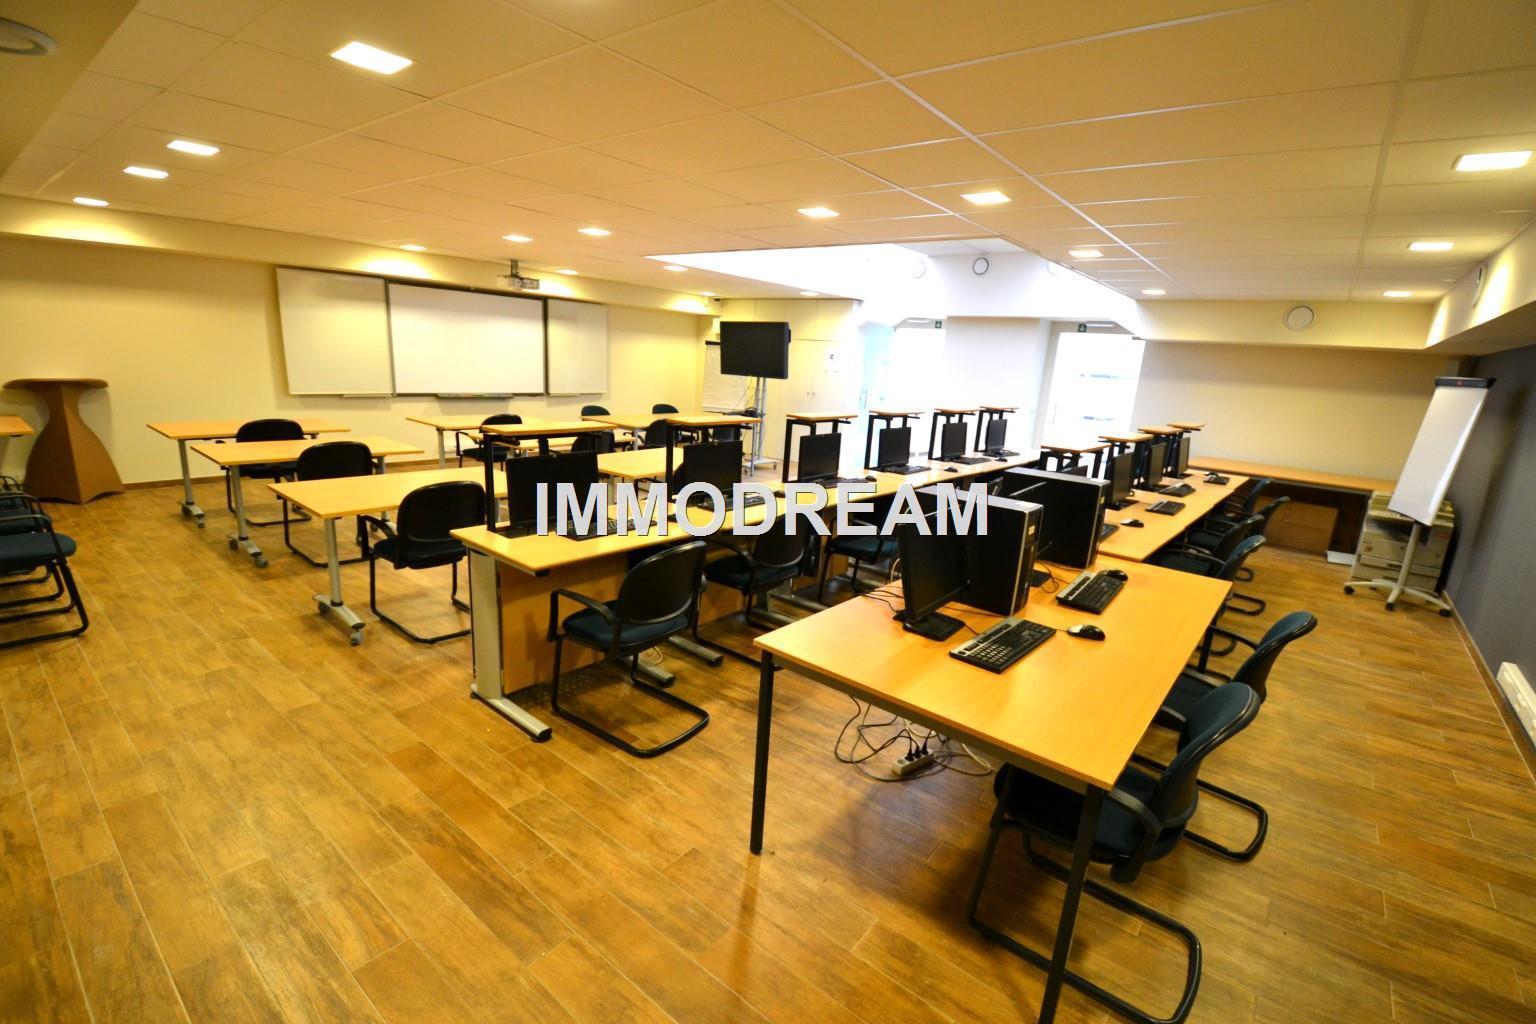 Mixt building off + res. - Woluwe-Saint-Lambert - #4025861-5